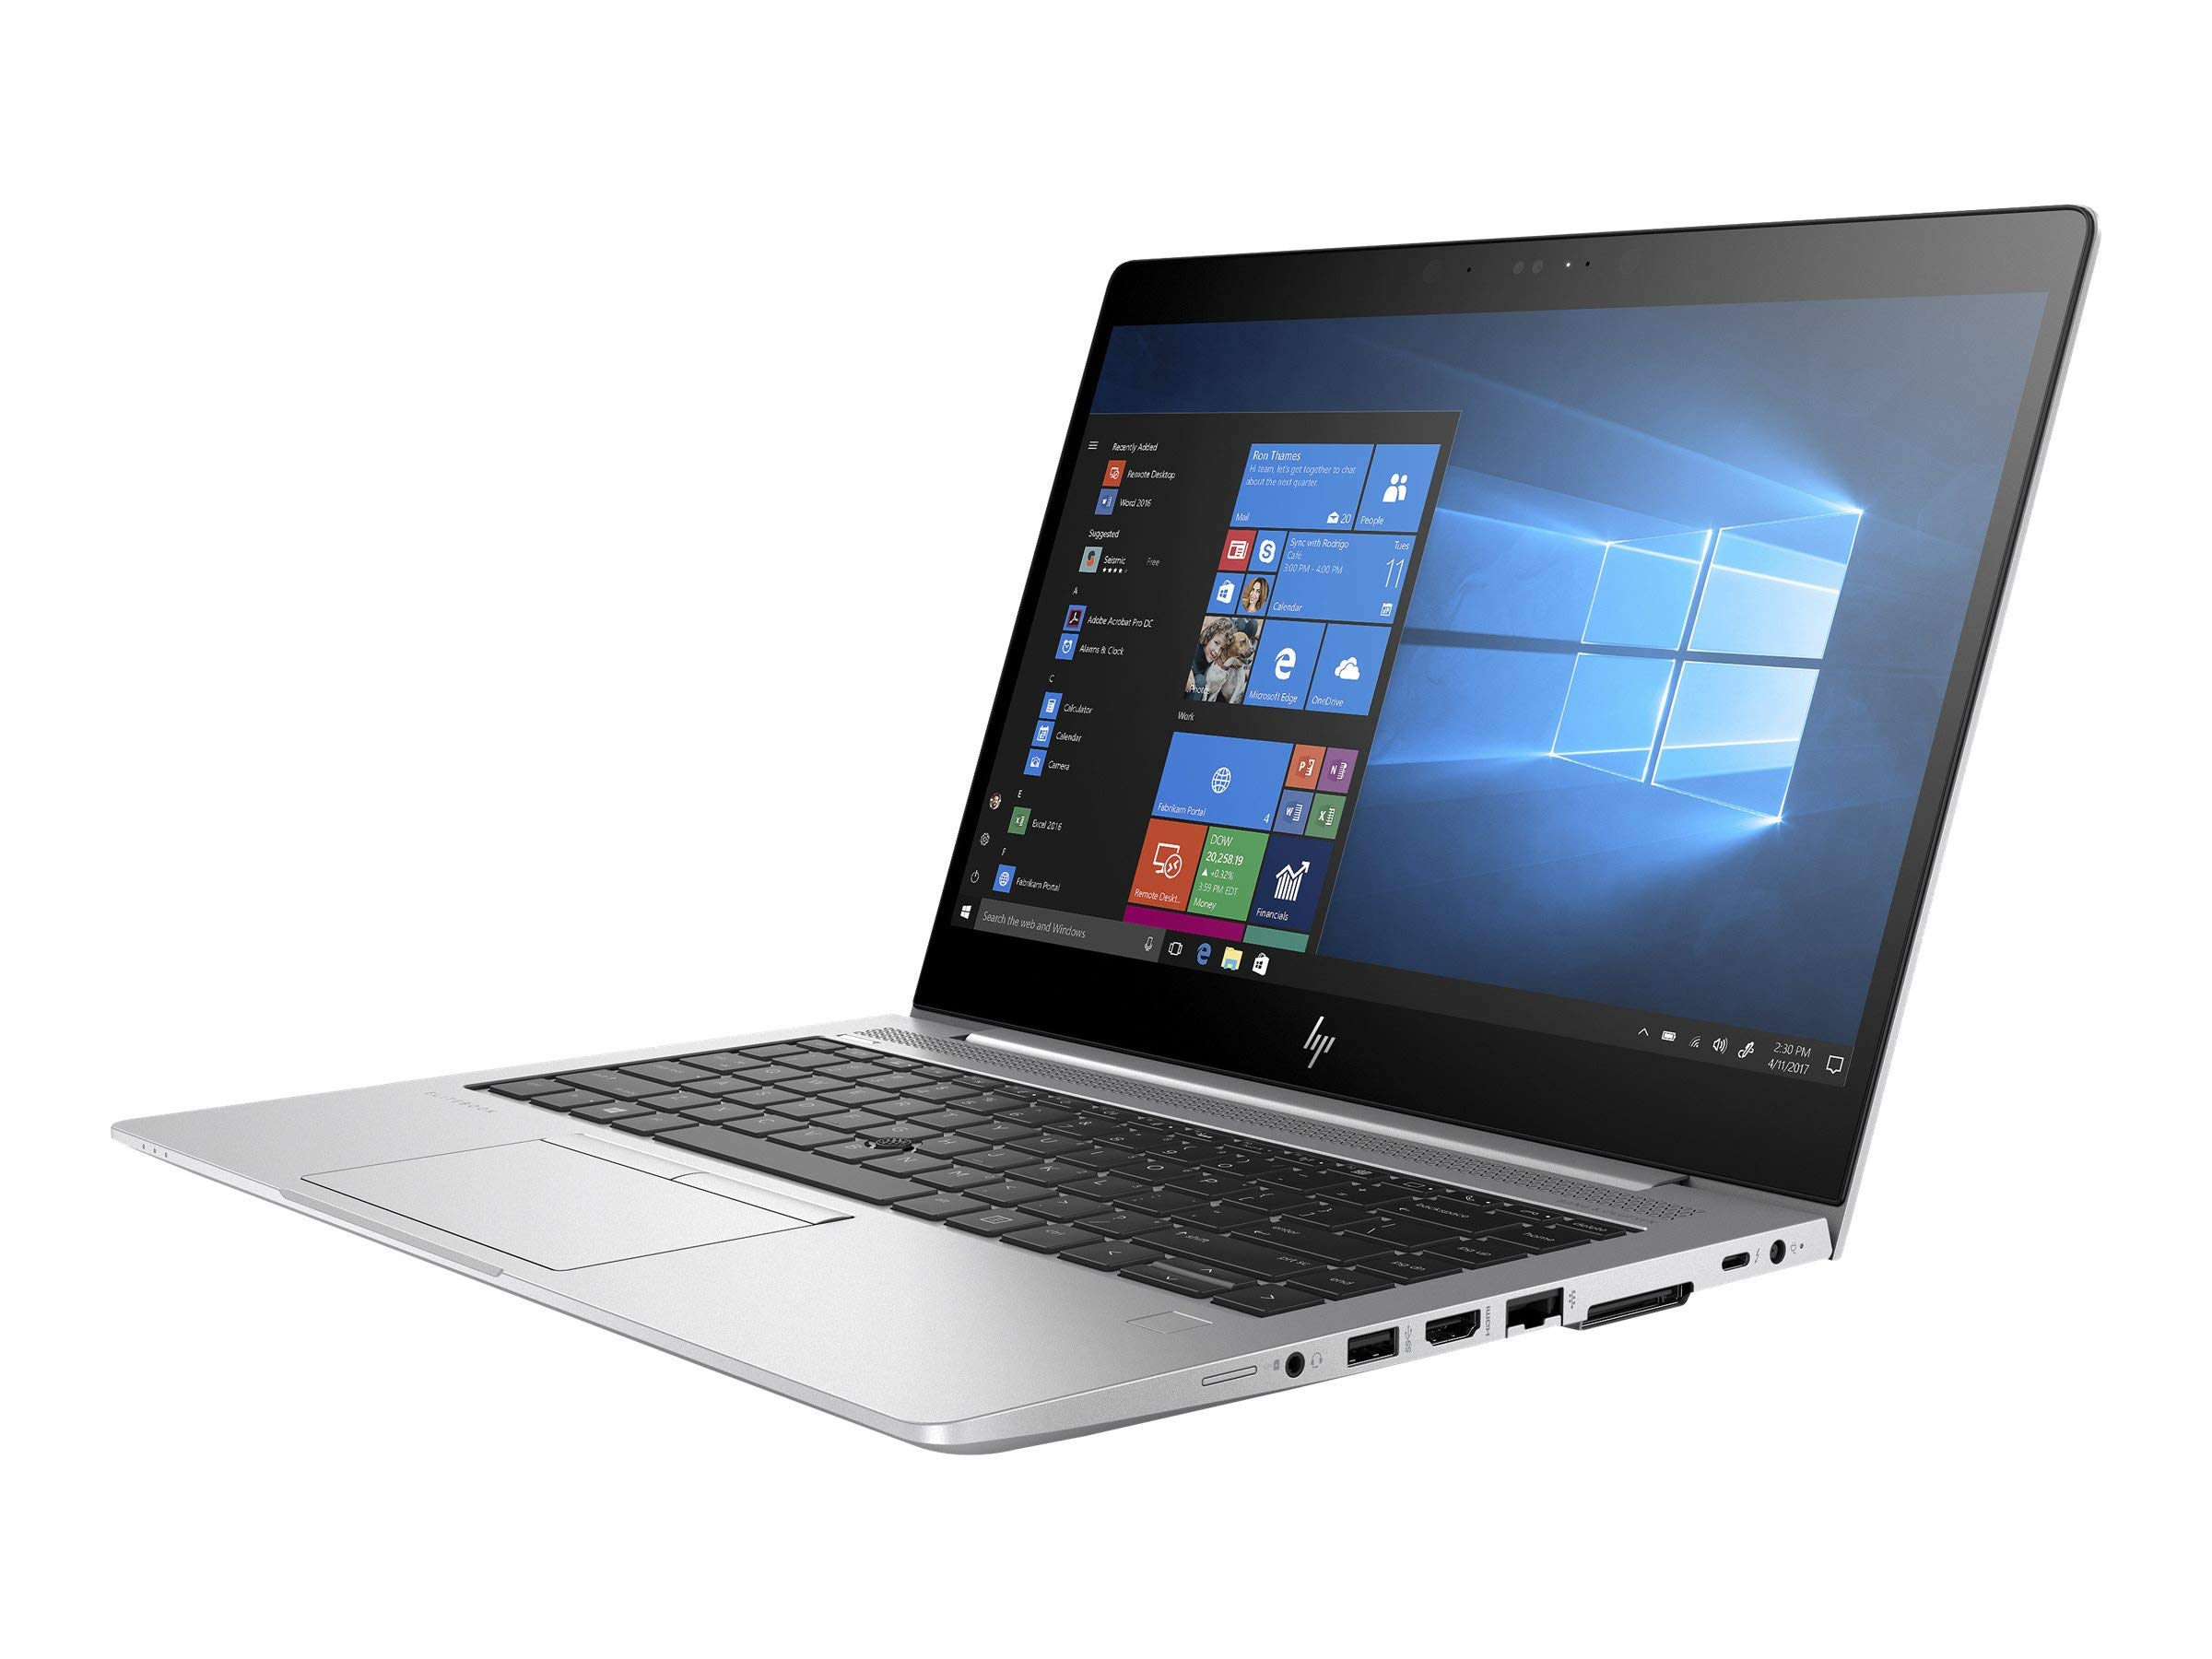 Amazon Com Hp 3rf07ut Aba Elitebook 840 G5 14 Notebook Windows Intel Core I5 1 6 Ghz 8 Gb Ram 256 Gb Ssd Silver 14 14 99 Inches Computers Accessories